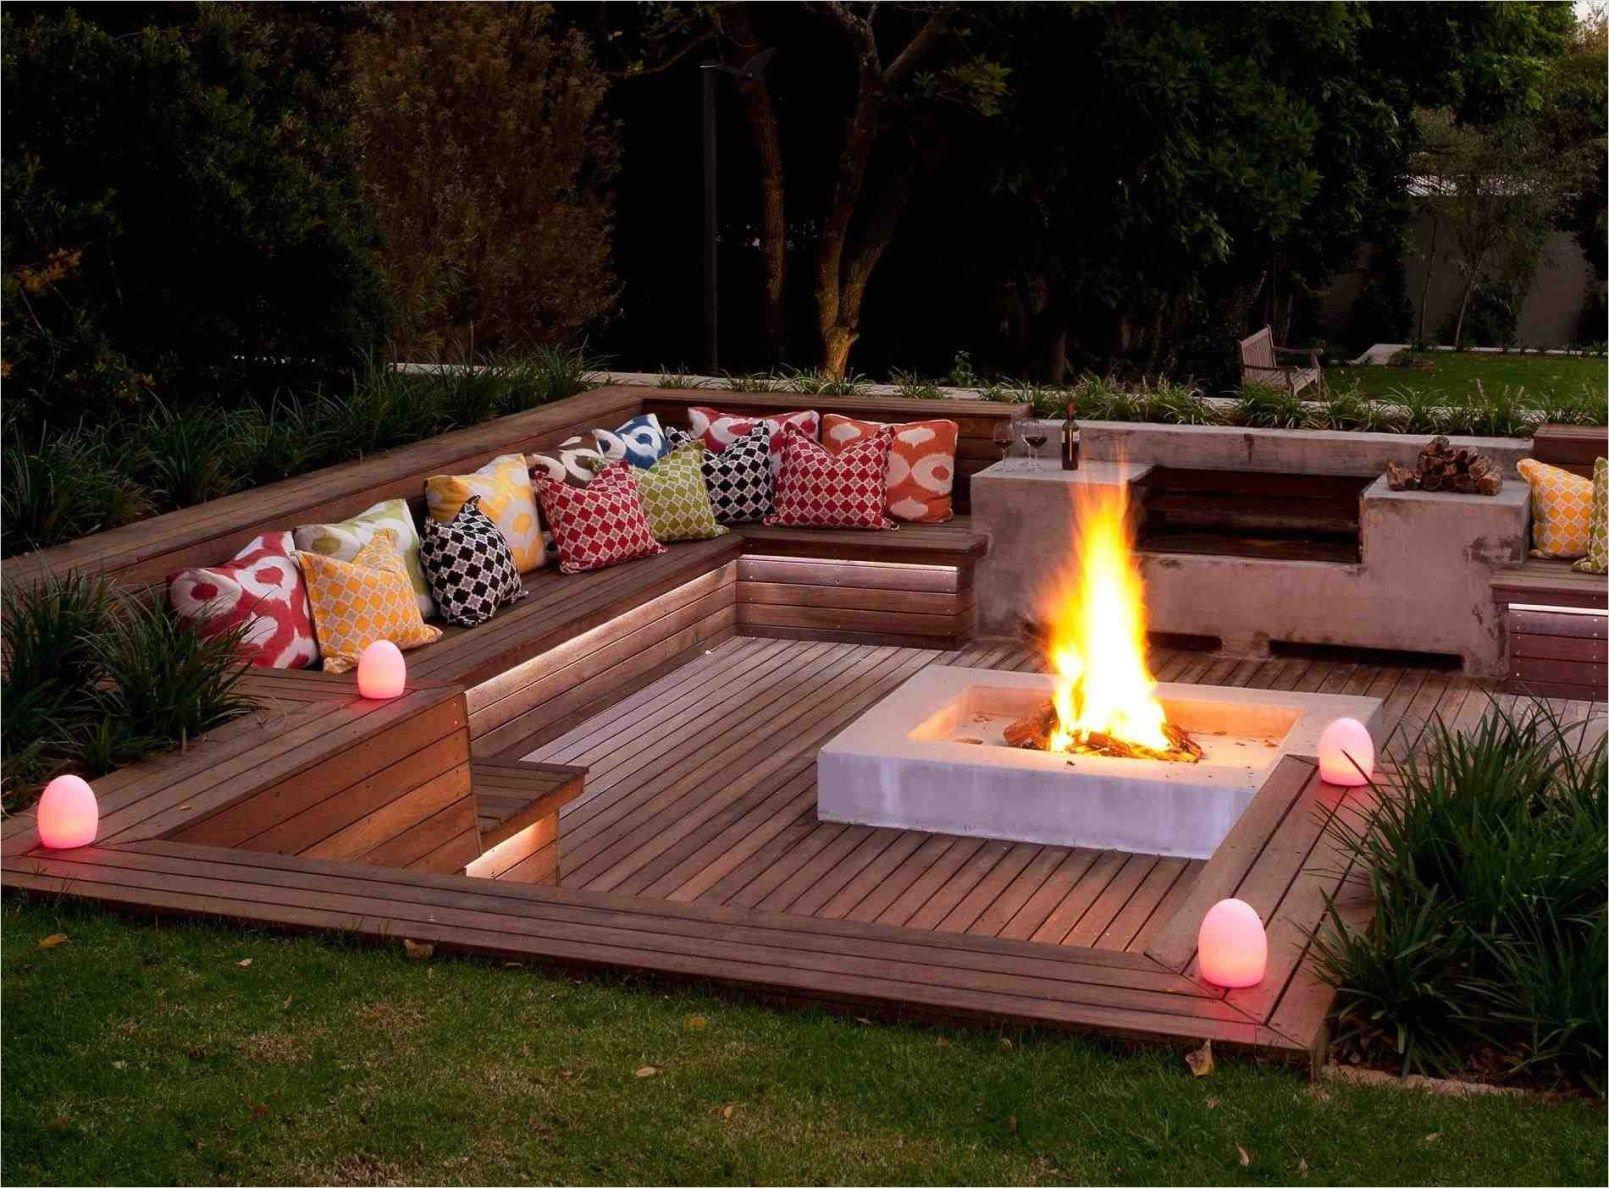 45 Perfect Backyard Bbq Landscaping Ideas Fire Pit Decor Fire